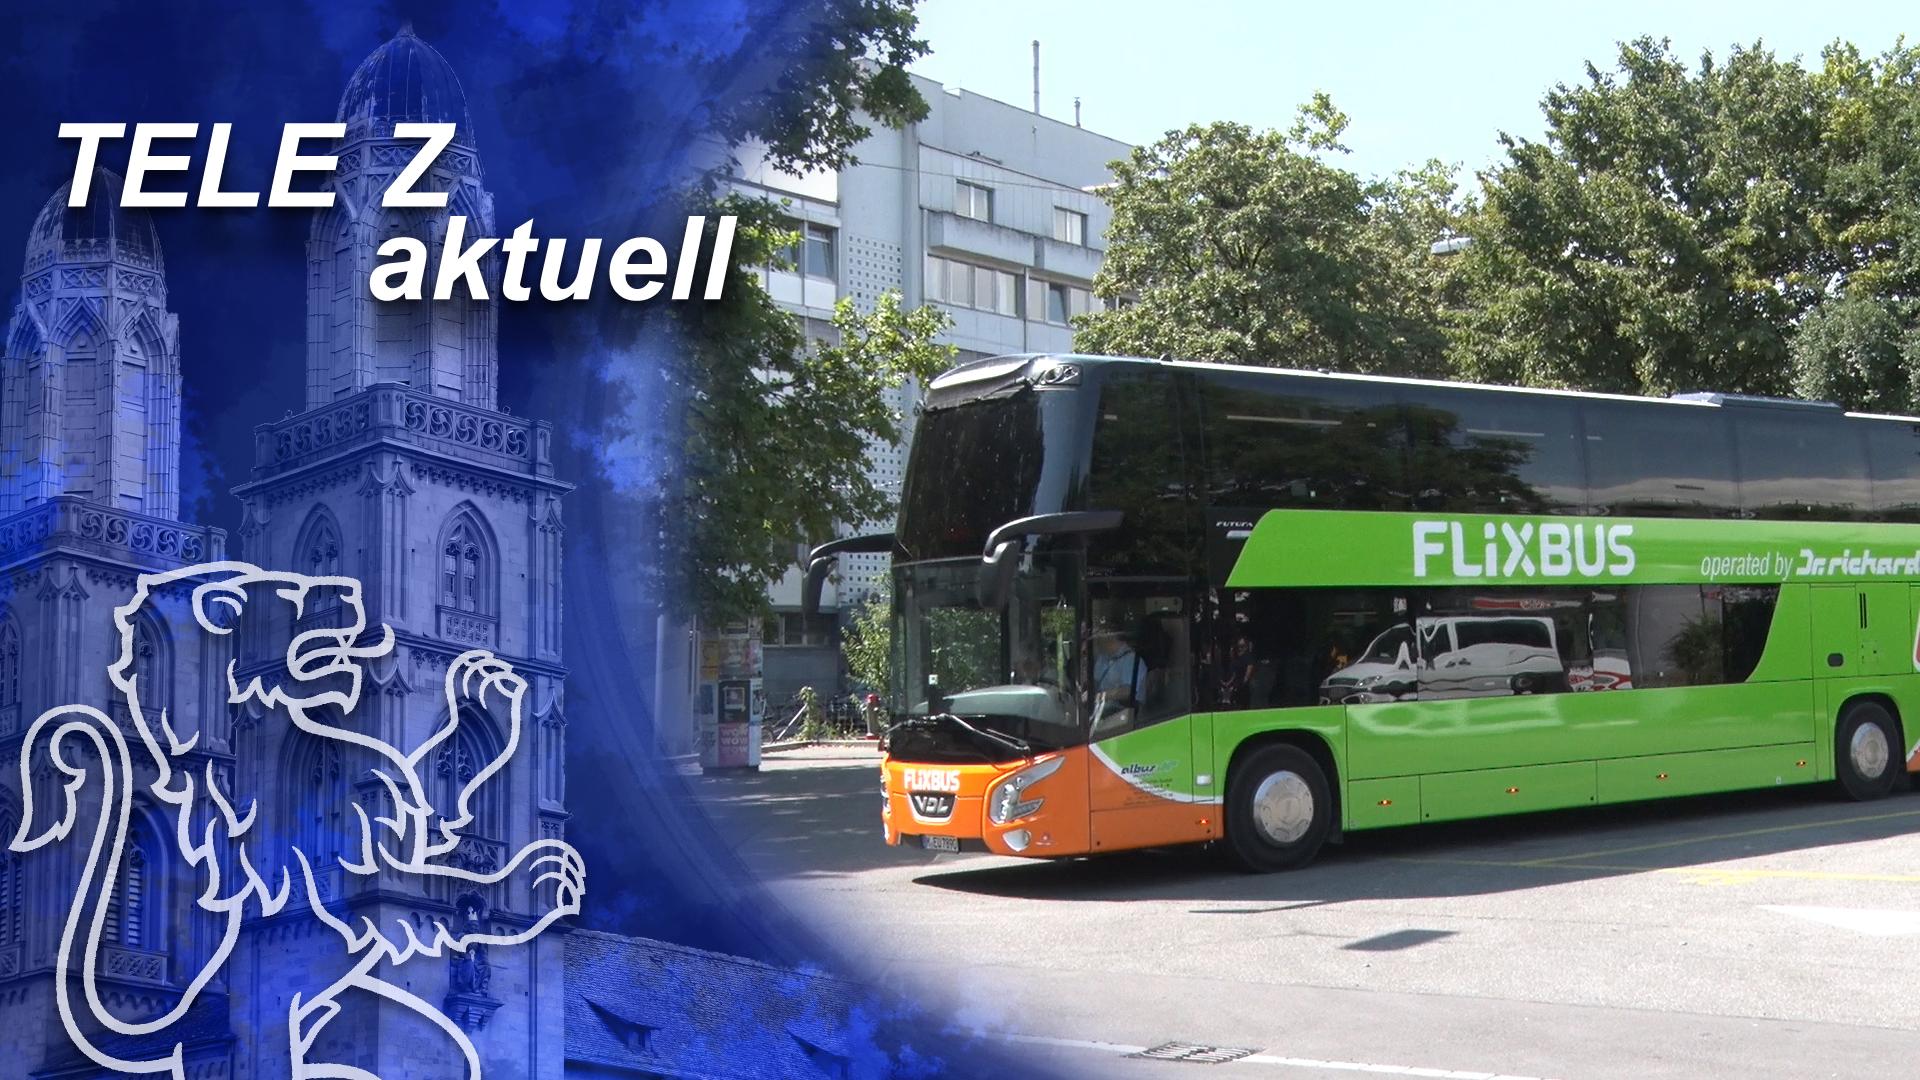 Flixbus Verspätung Aktuell